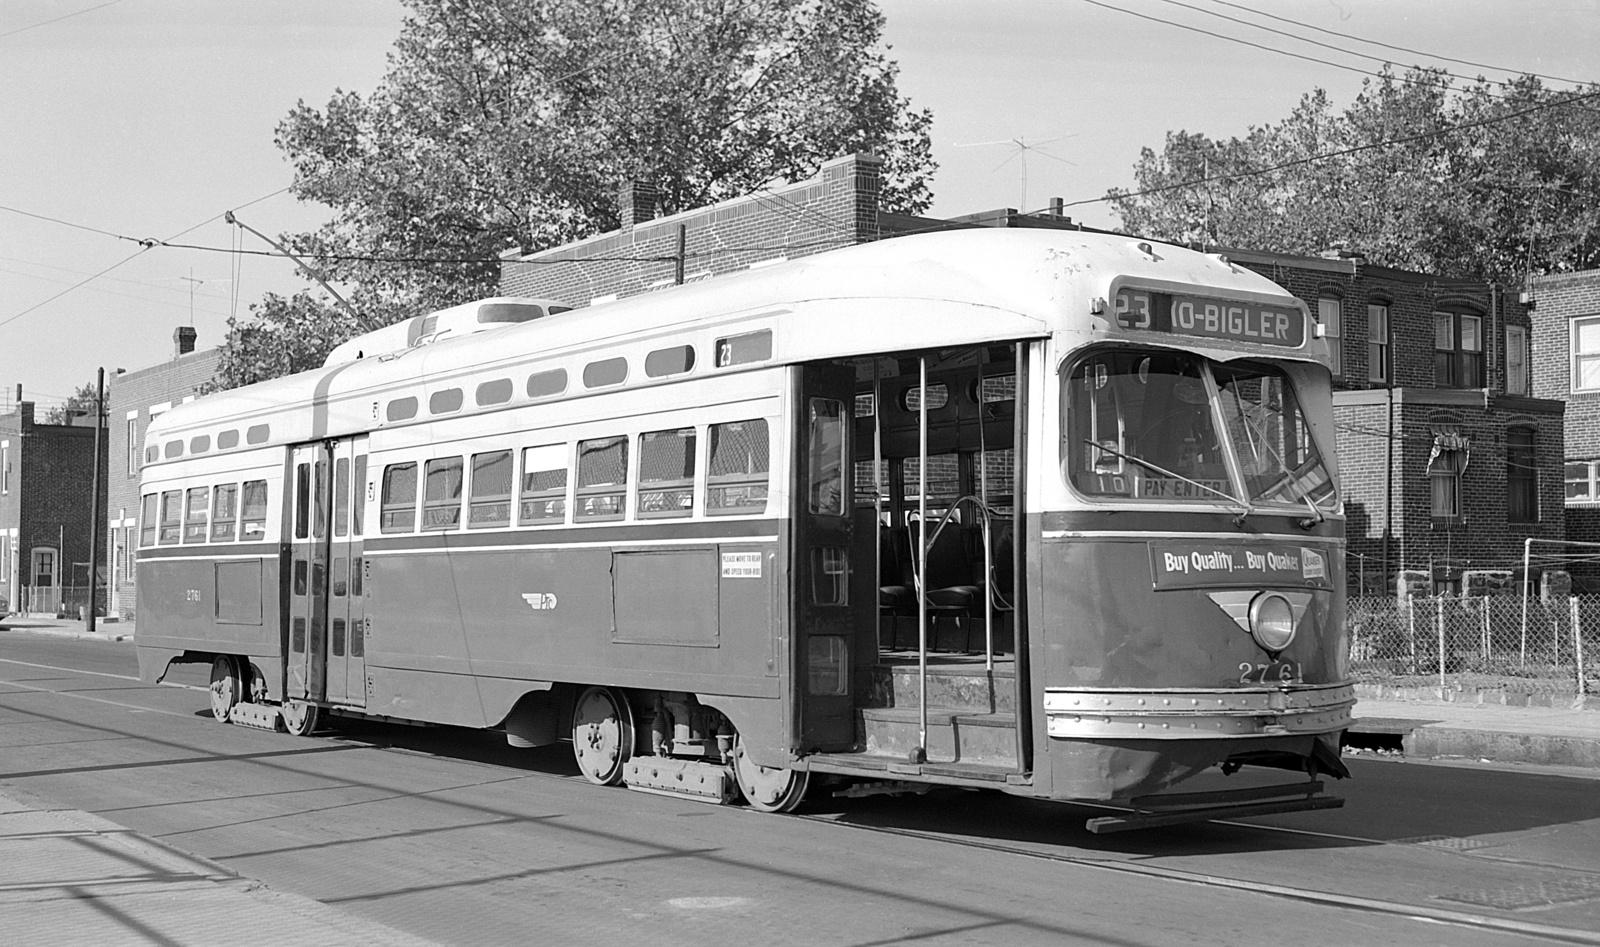 (592k, 1600x947)<br><b>Country:</b> United States<br><b>City:</b> Philadelphia, PA<br><b>System:</b> SEPTA (or Predecessor)<br><b>Line:</b> Rt. 23-Germantown<br><b>Location:</b> 10th/Bigler<br><b>Car:</b> PTC/SEPTA Postwar All-electric PCC (St.Louis, 1947) 2761 <br><b>Collection of:</b> David Pirmann<br><b>Date:</b> 10/1961<br><b>Viewed (this week/total):</b> 1 / 52